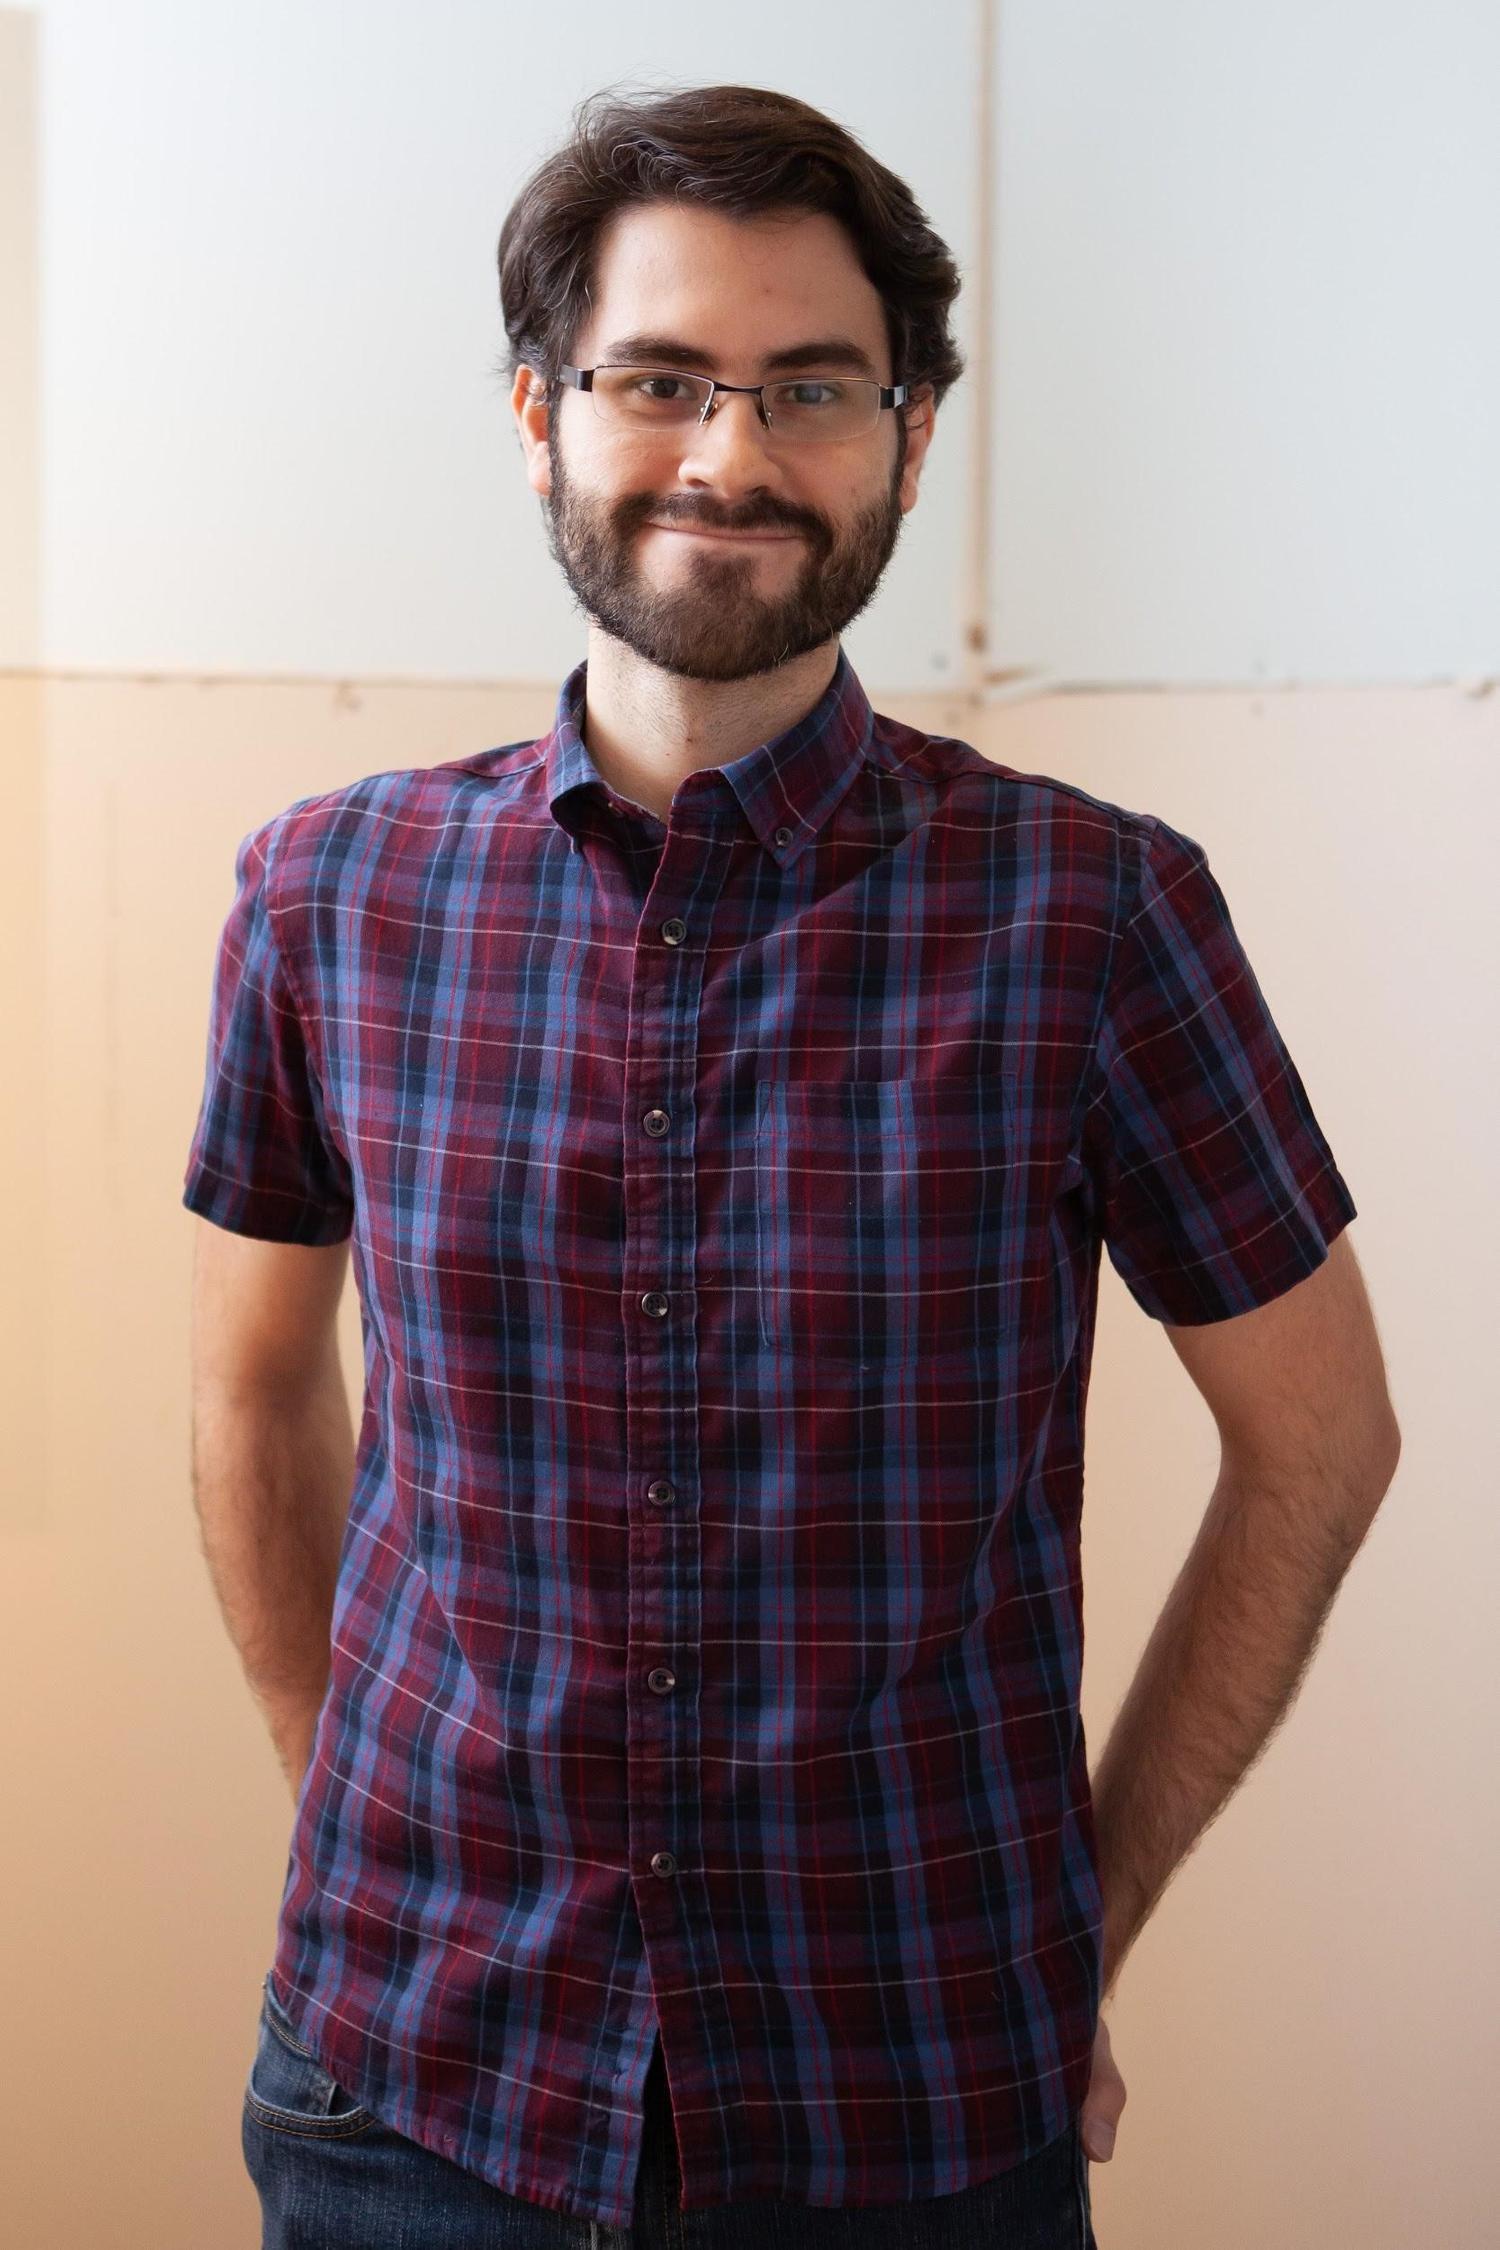 Maikel Carrion - Artistic Intelligence Data Analytics Professional